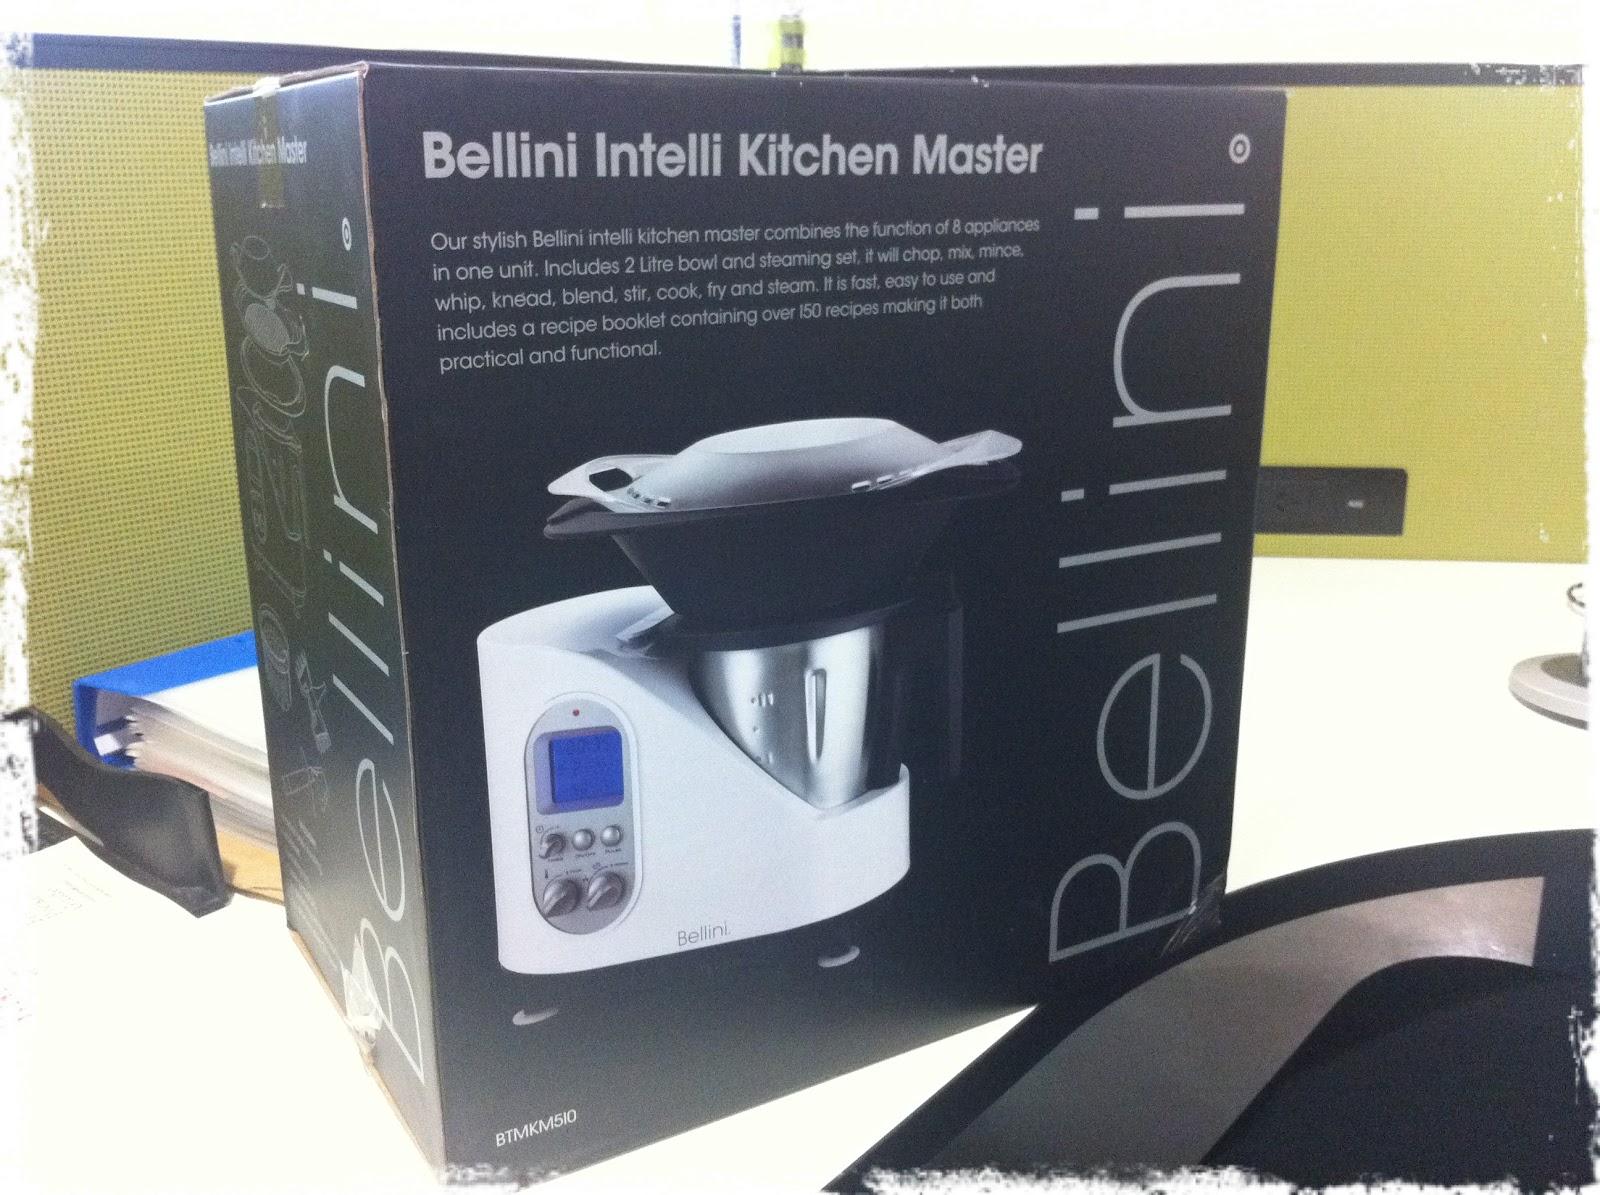 Bellini Intelli Kitchen Master Recipes